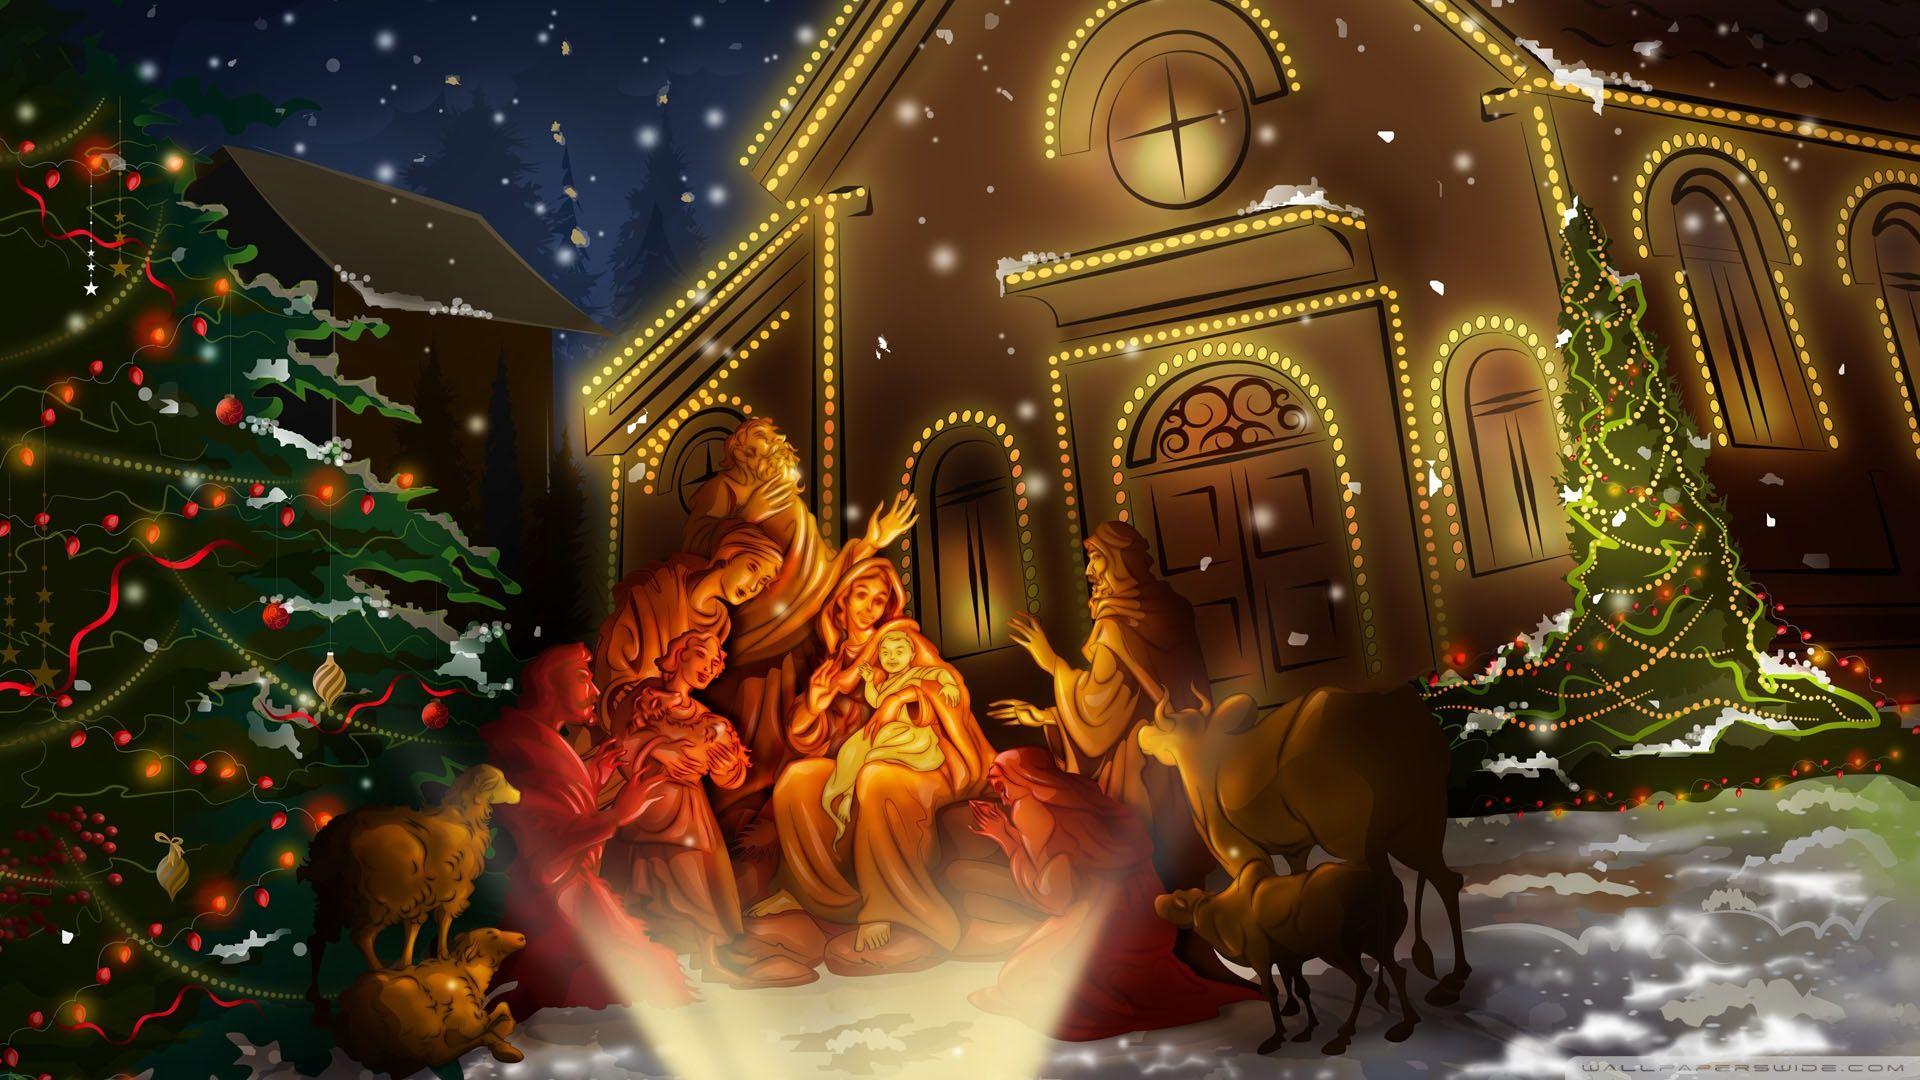 Top Wallpaper Music Christmas - a834f4d77432a2e4bd5a187ad63eb0bb  HD_619864.jpg